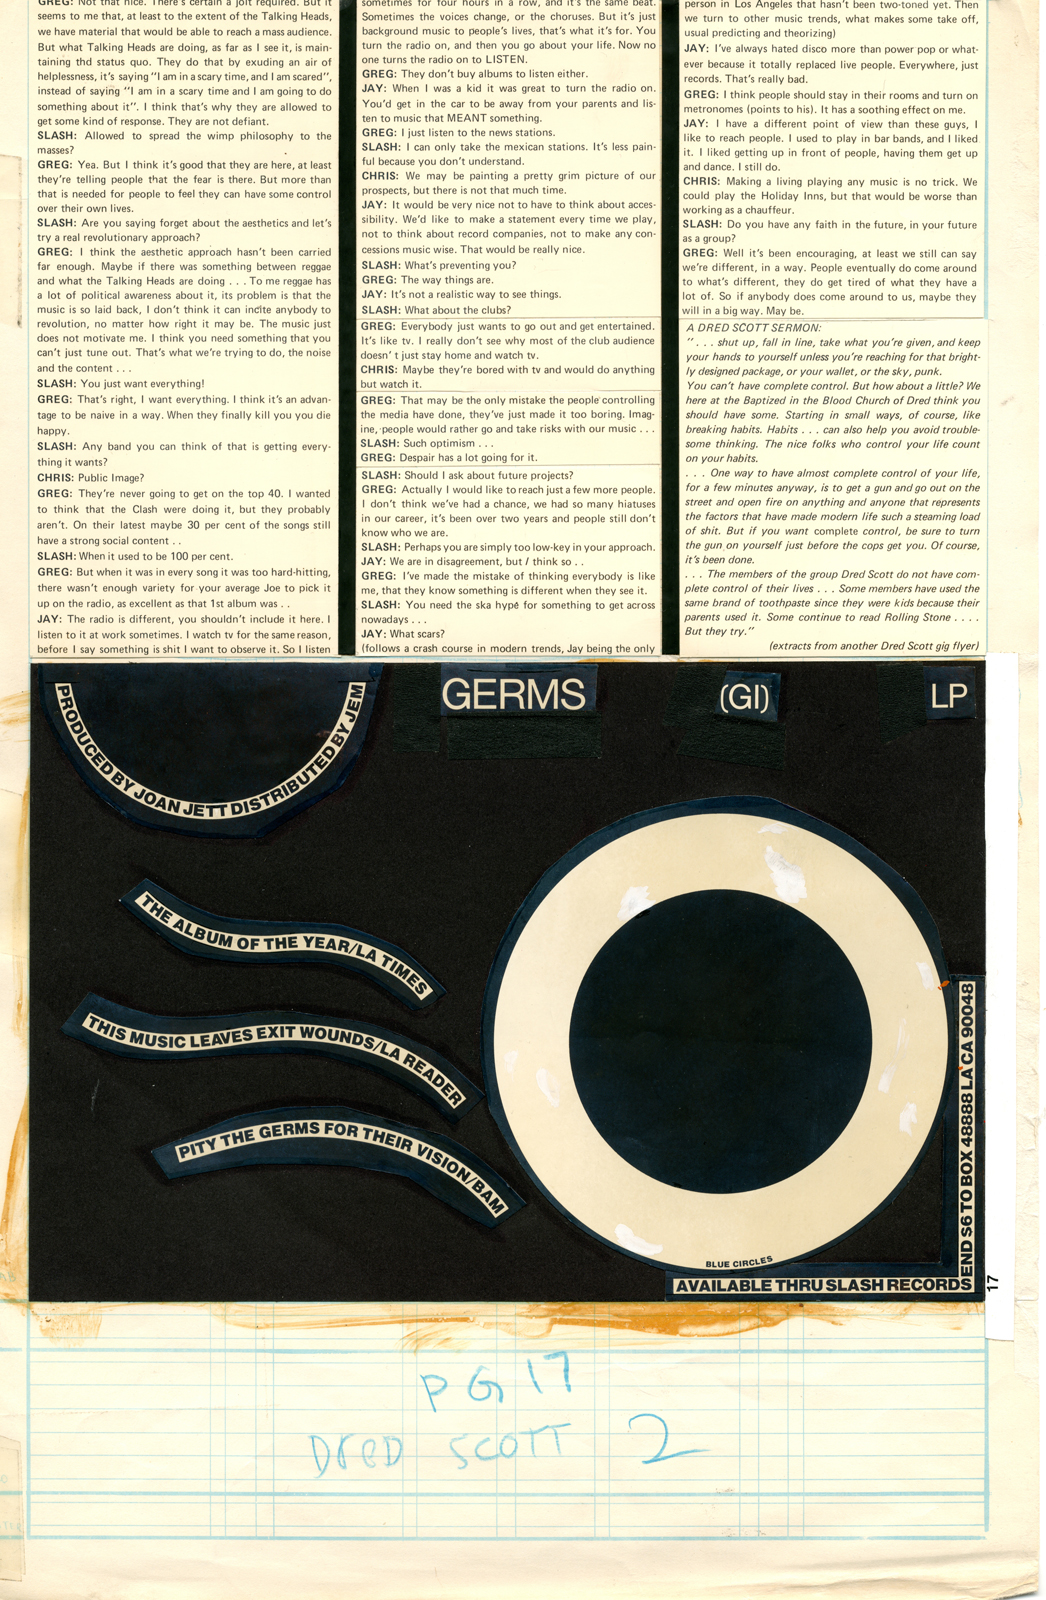 Germs (GI) LP Add - Slash Magazine